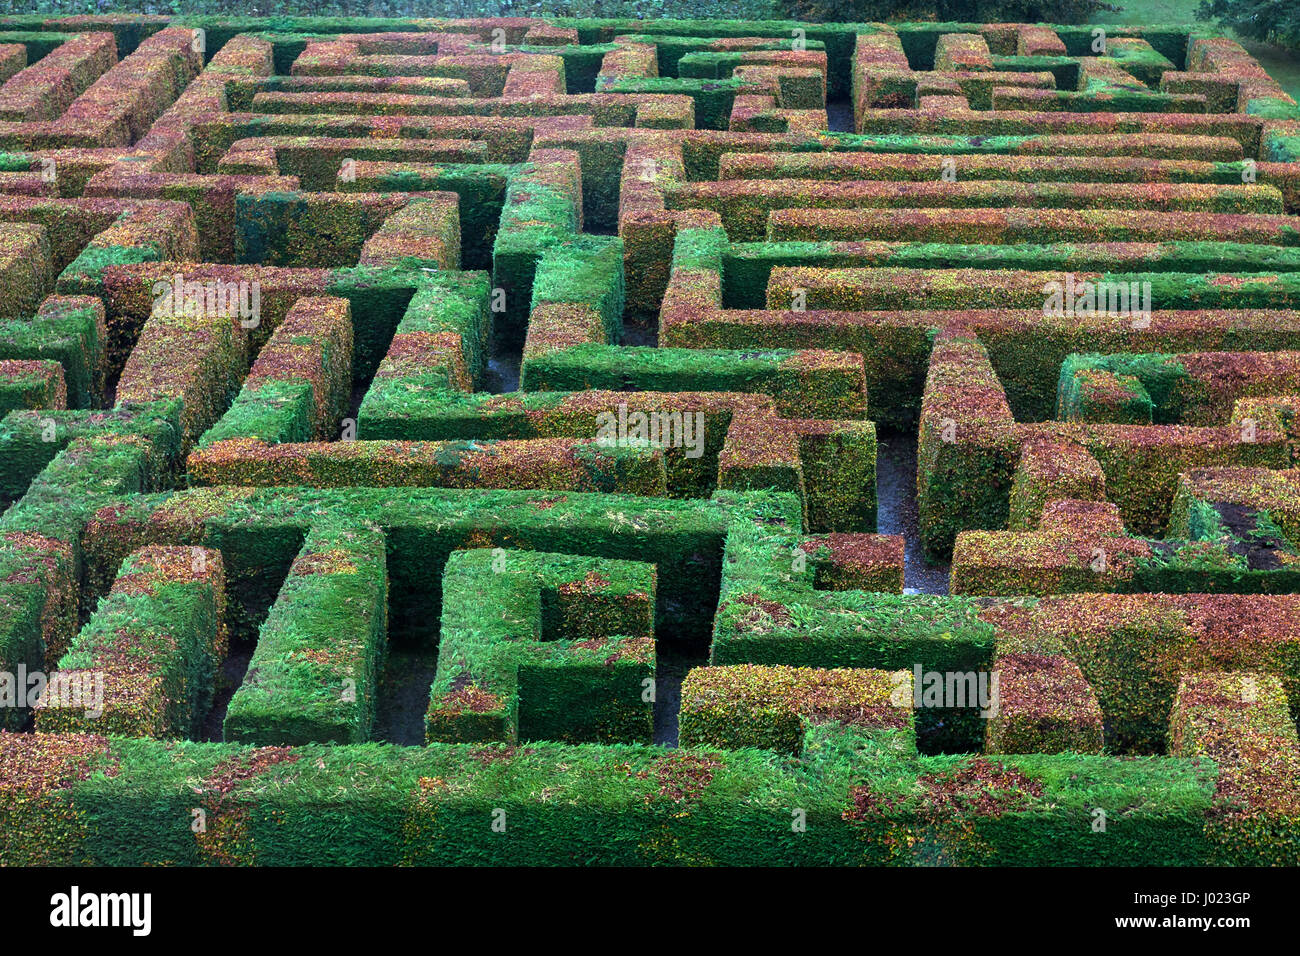 The maze at Traquair House, Scottish Borders, UK - Stock Image